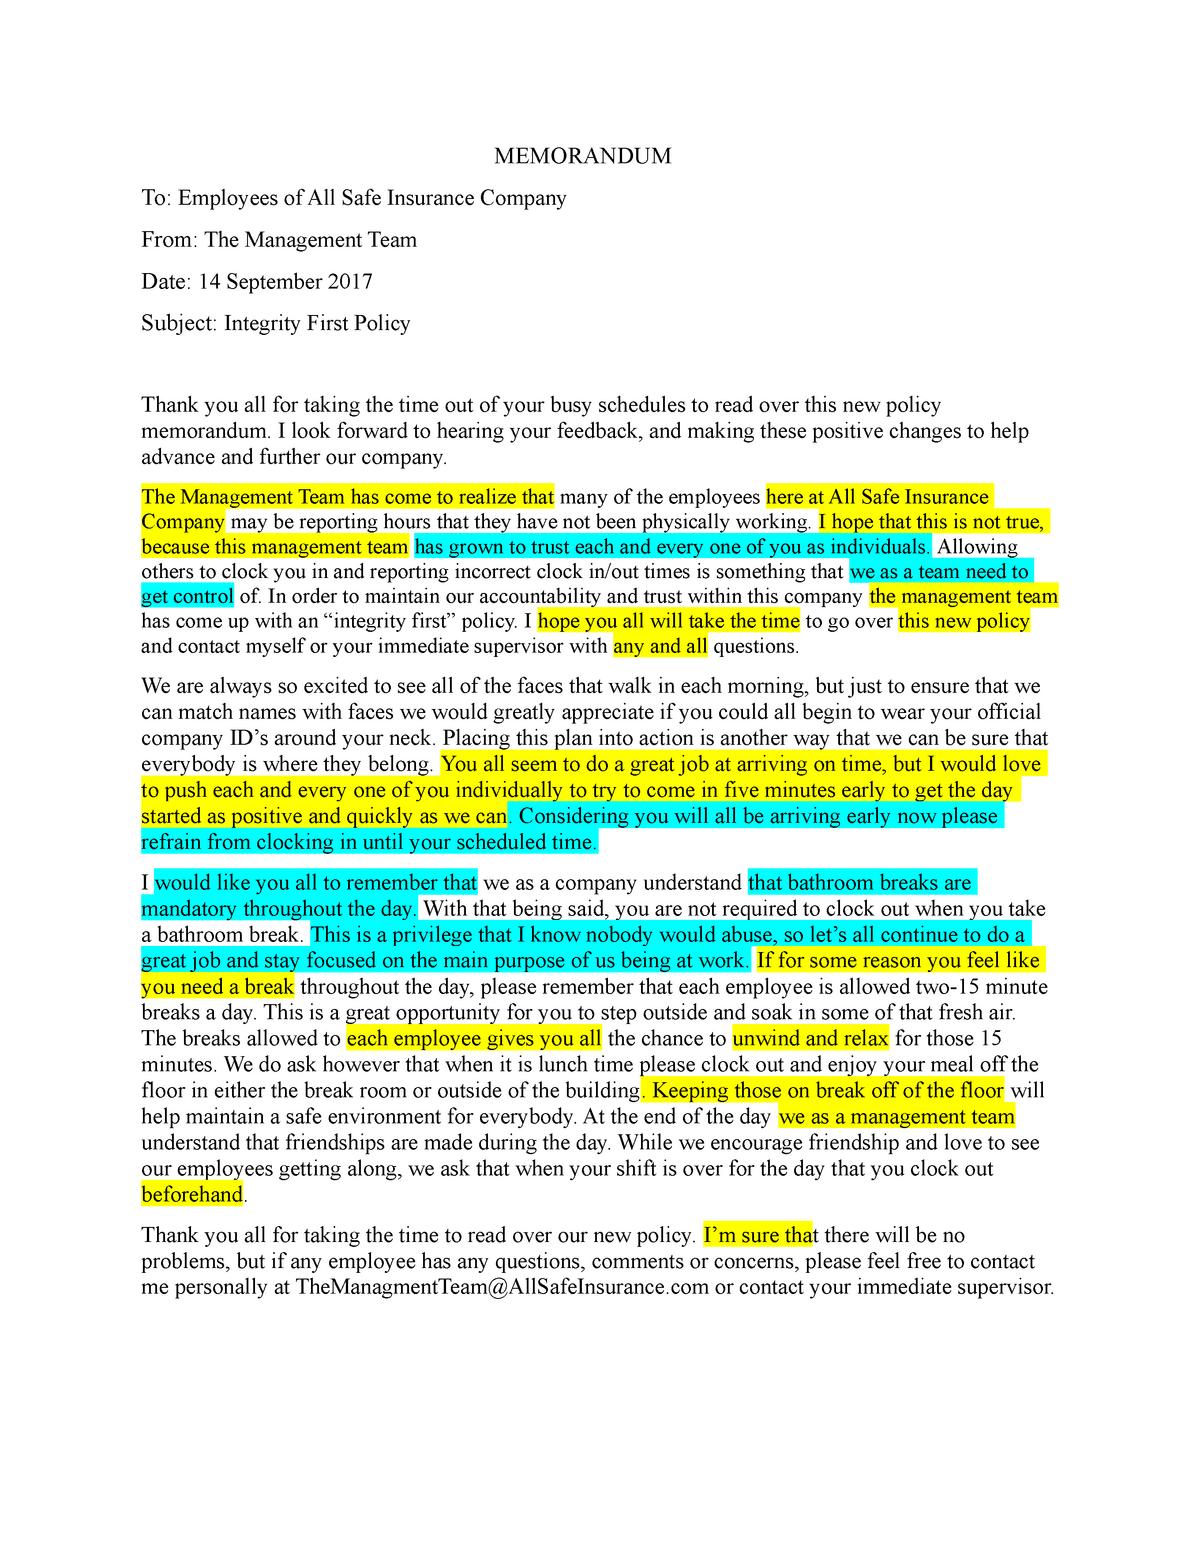 Memorandum Final Copy - Memo to help professional communication